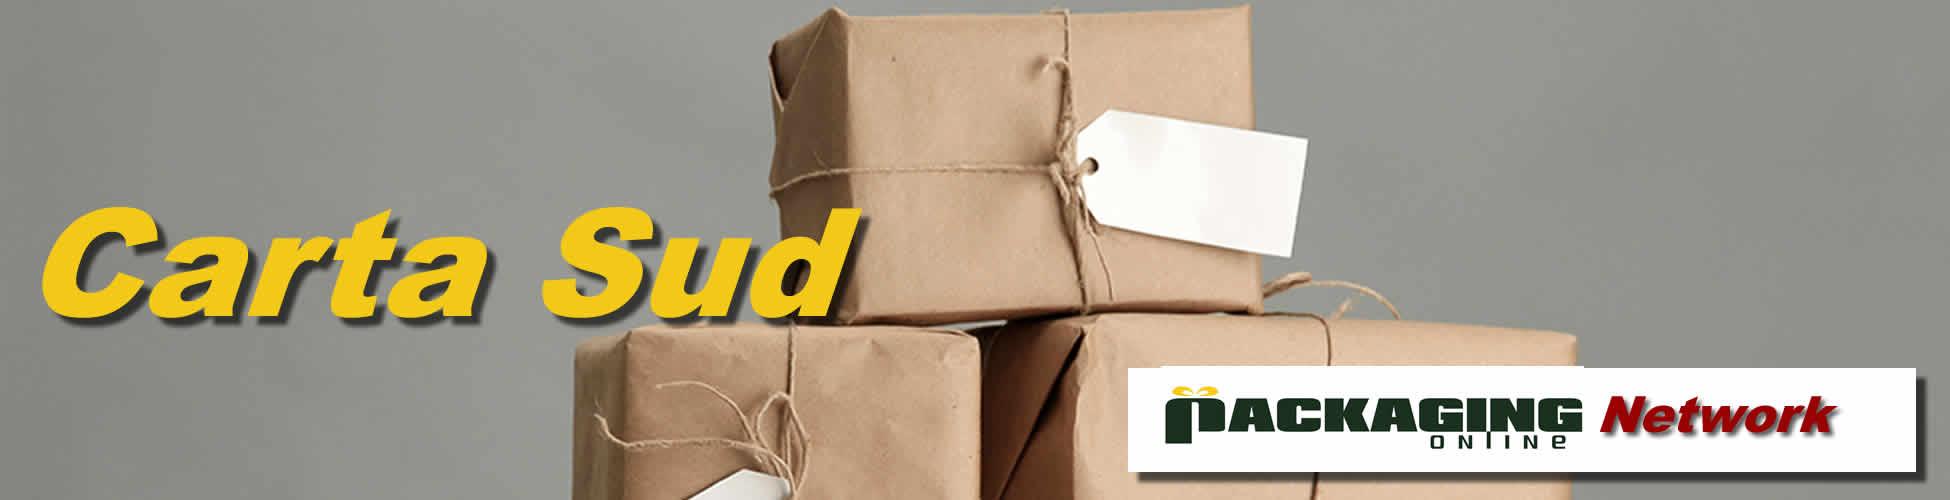 carta sud packaging online